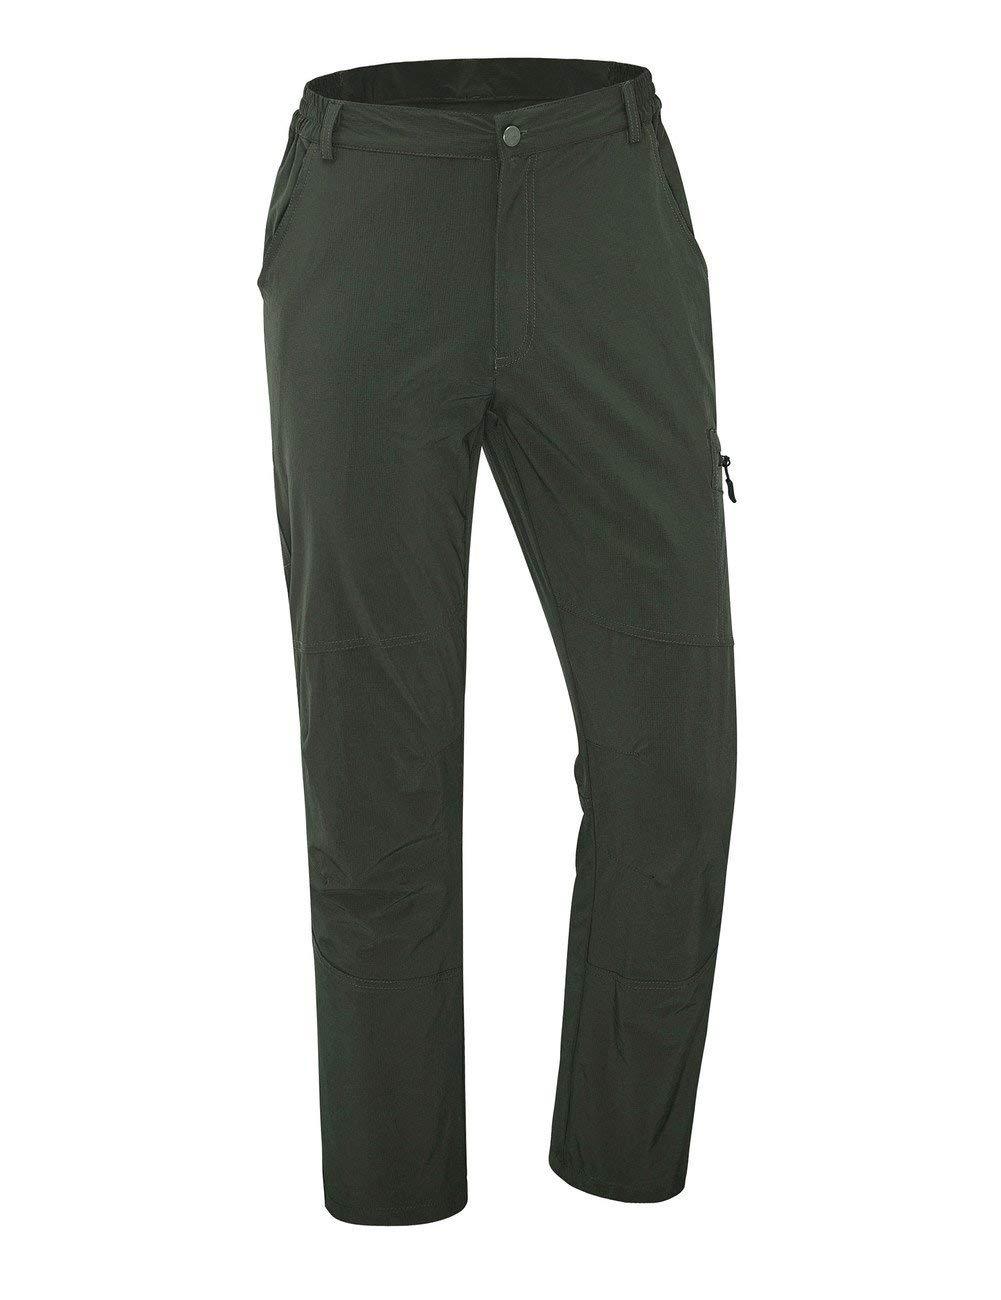 0a43b049faa Get Quotations · Hopgo Men's Waterproof Outdoor Sport Pants Quick Dry Cargo  Pants Hiking Pants With Drawstring